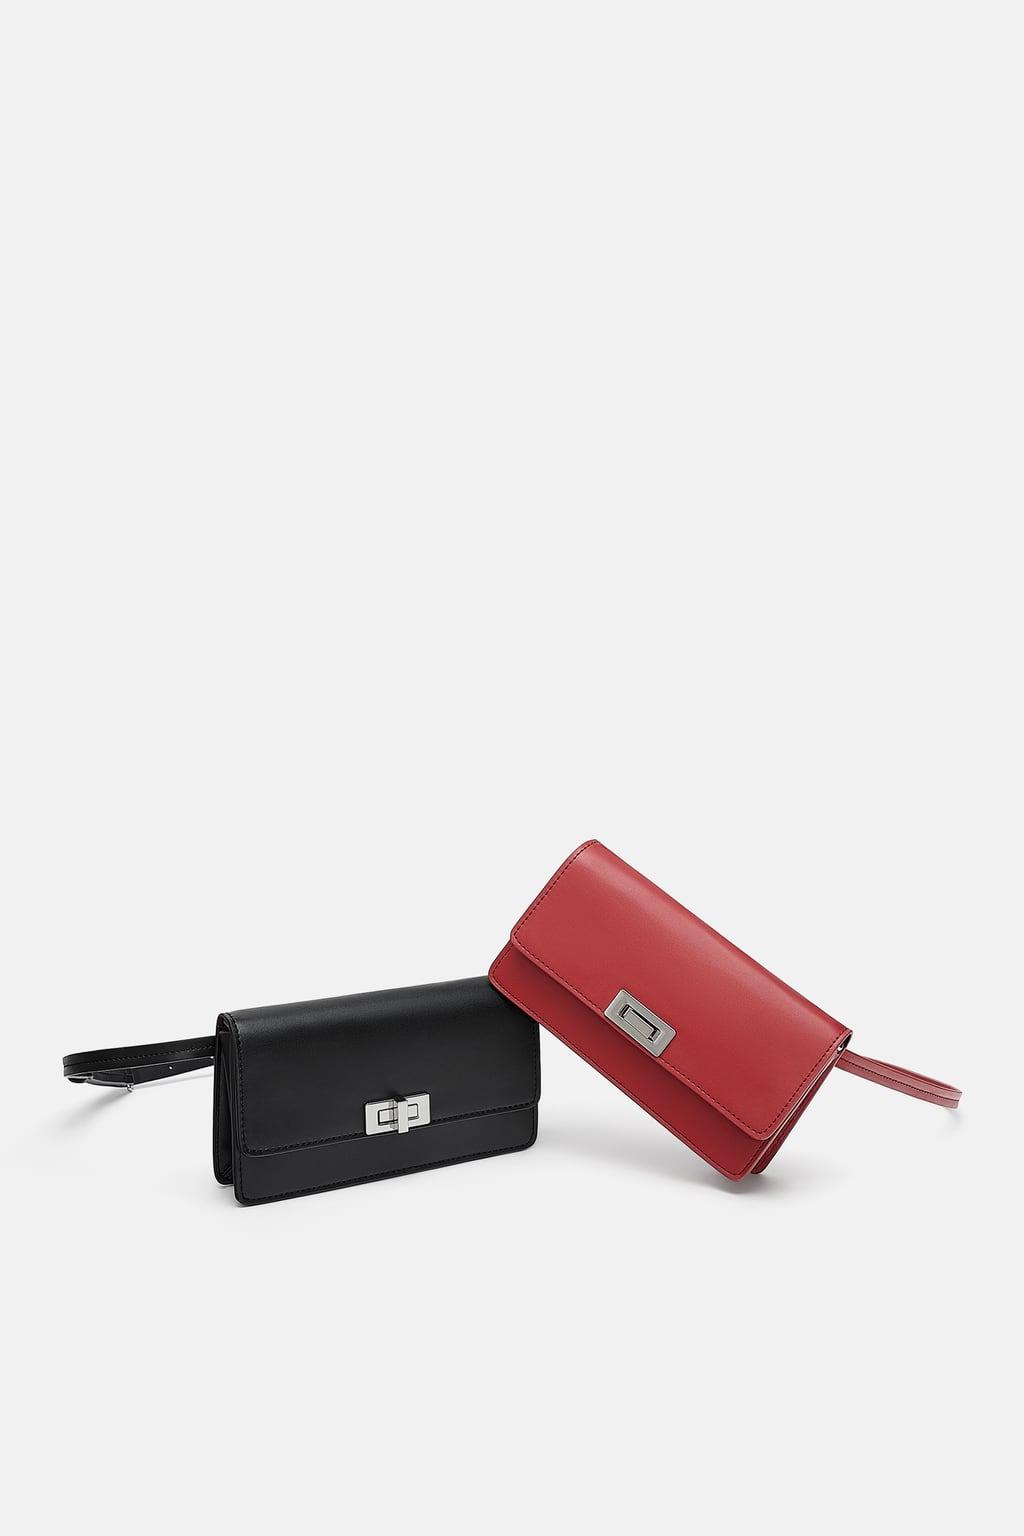 Crossbody Belt Bag, $9.99